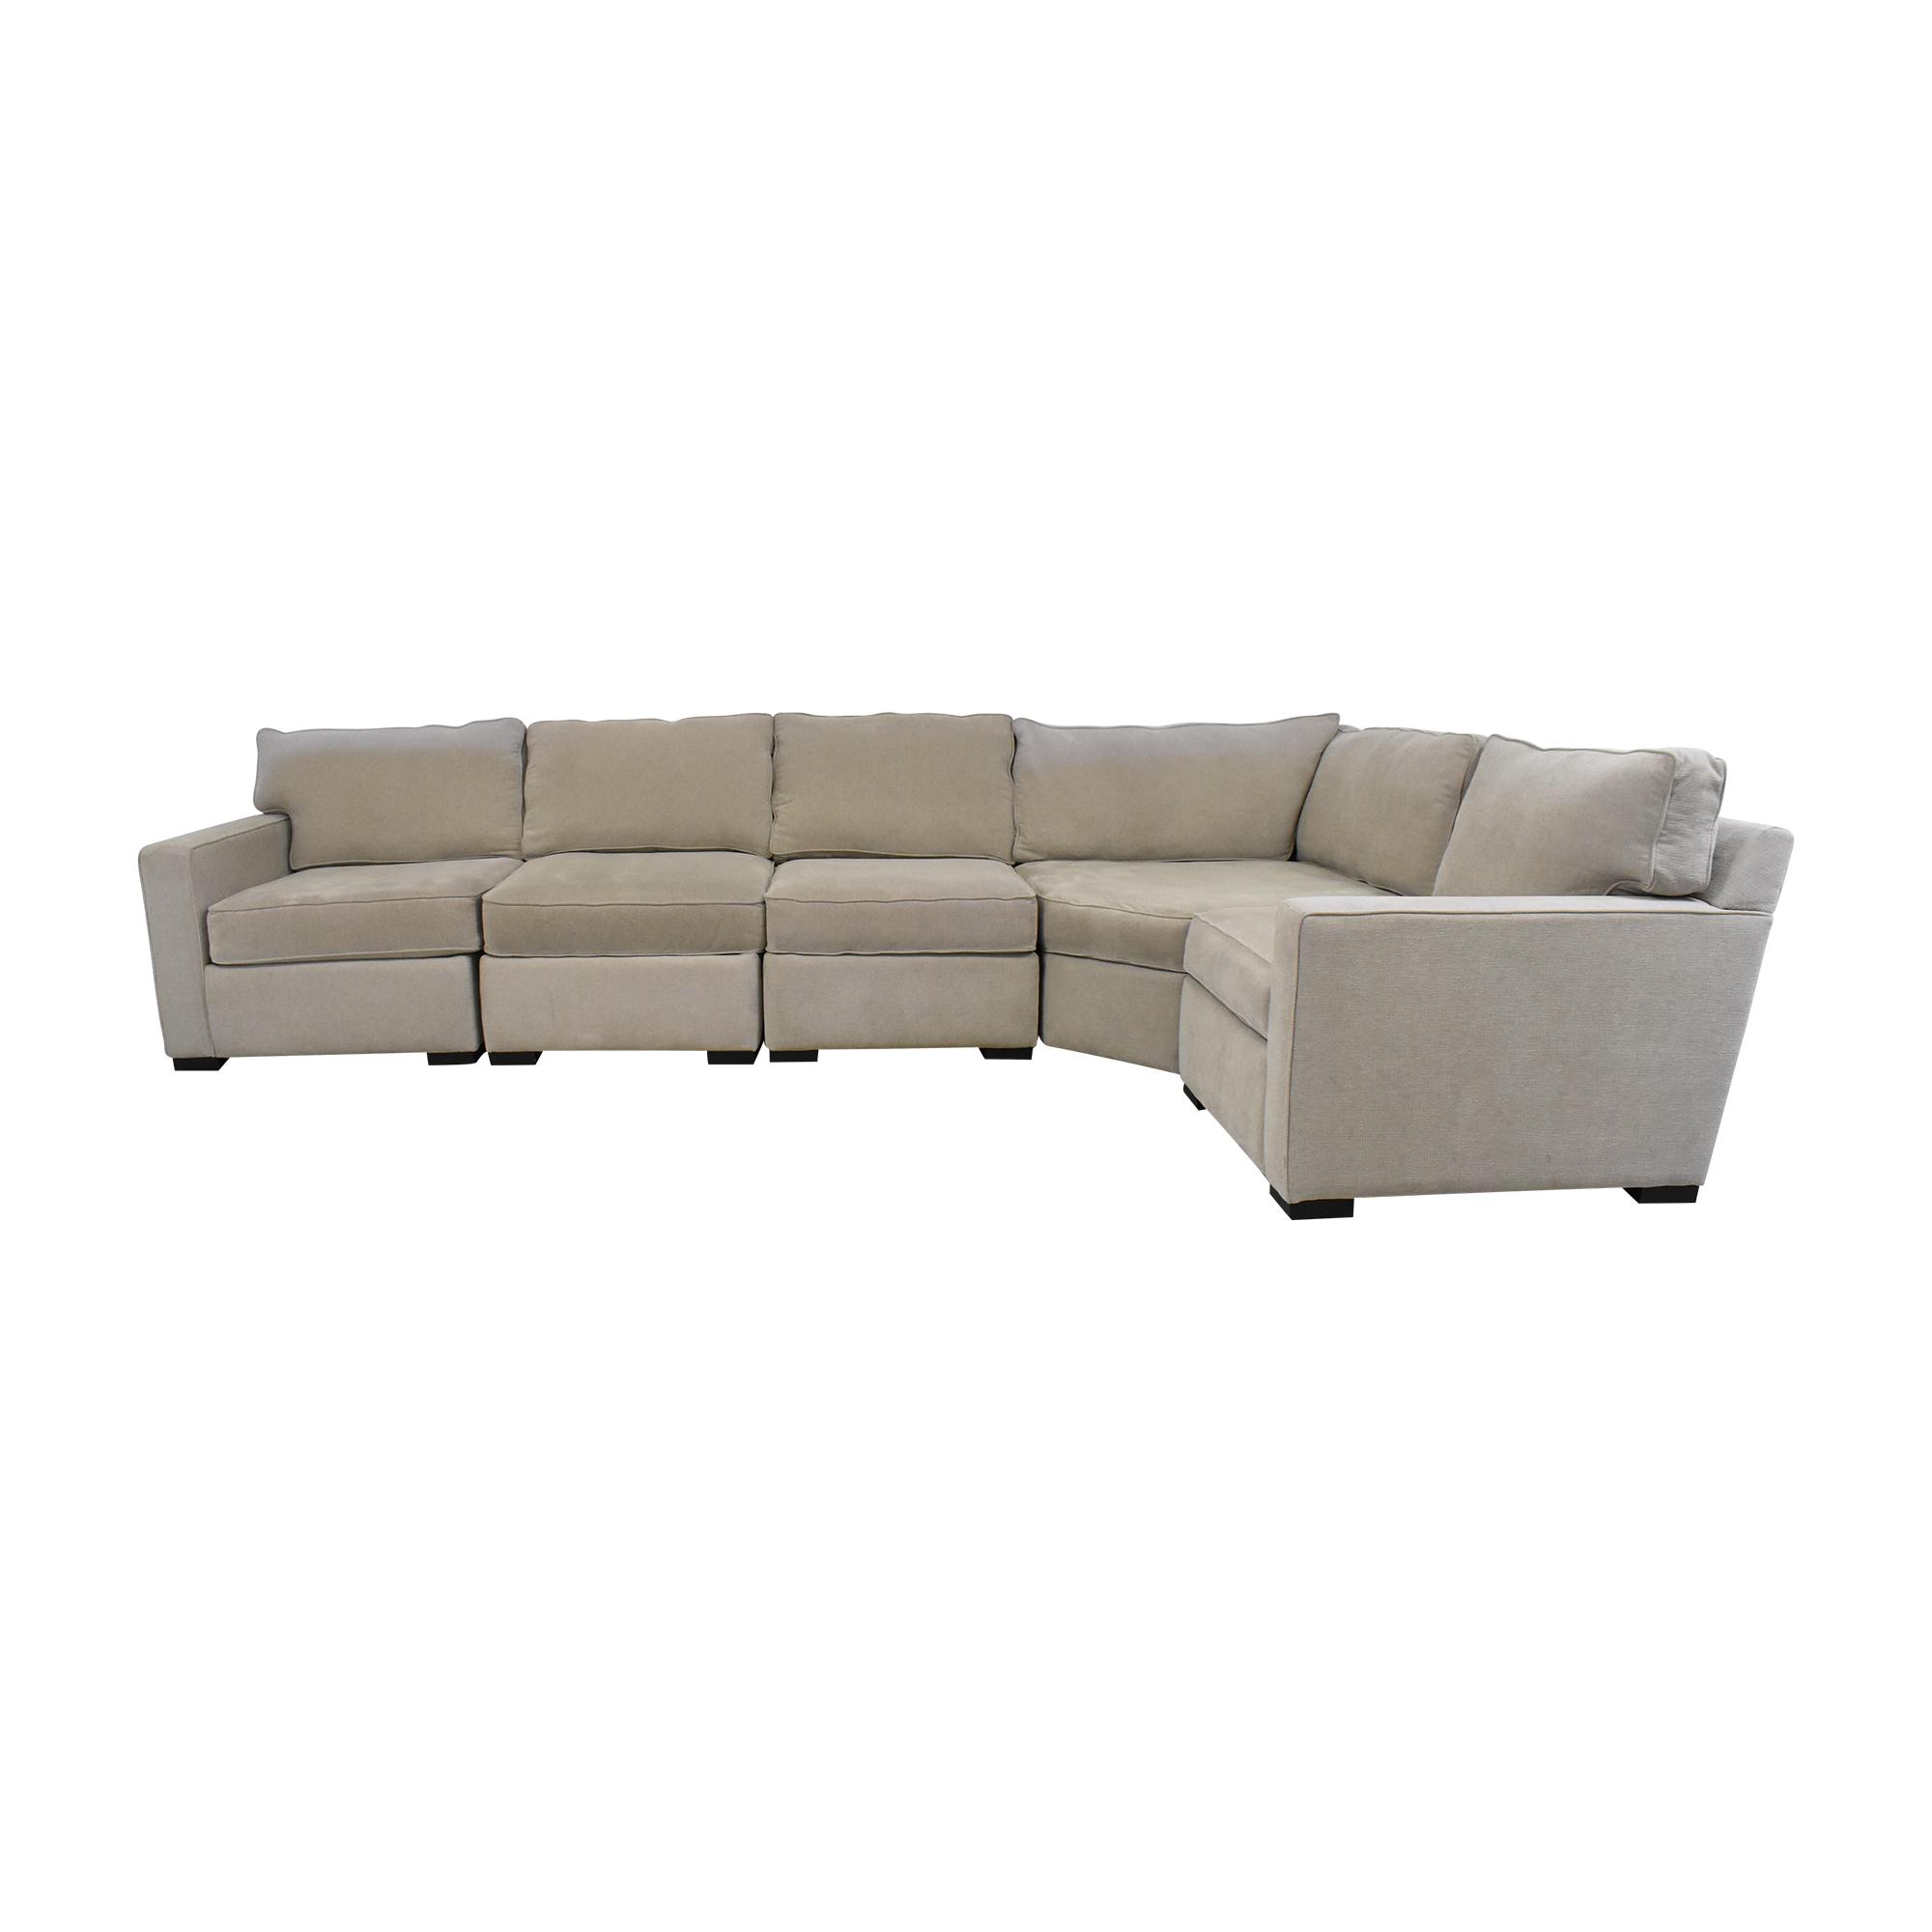 Macy's Macy's L Shaped Sectional Sofa on sale